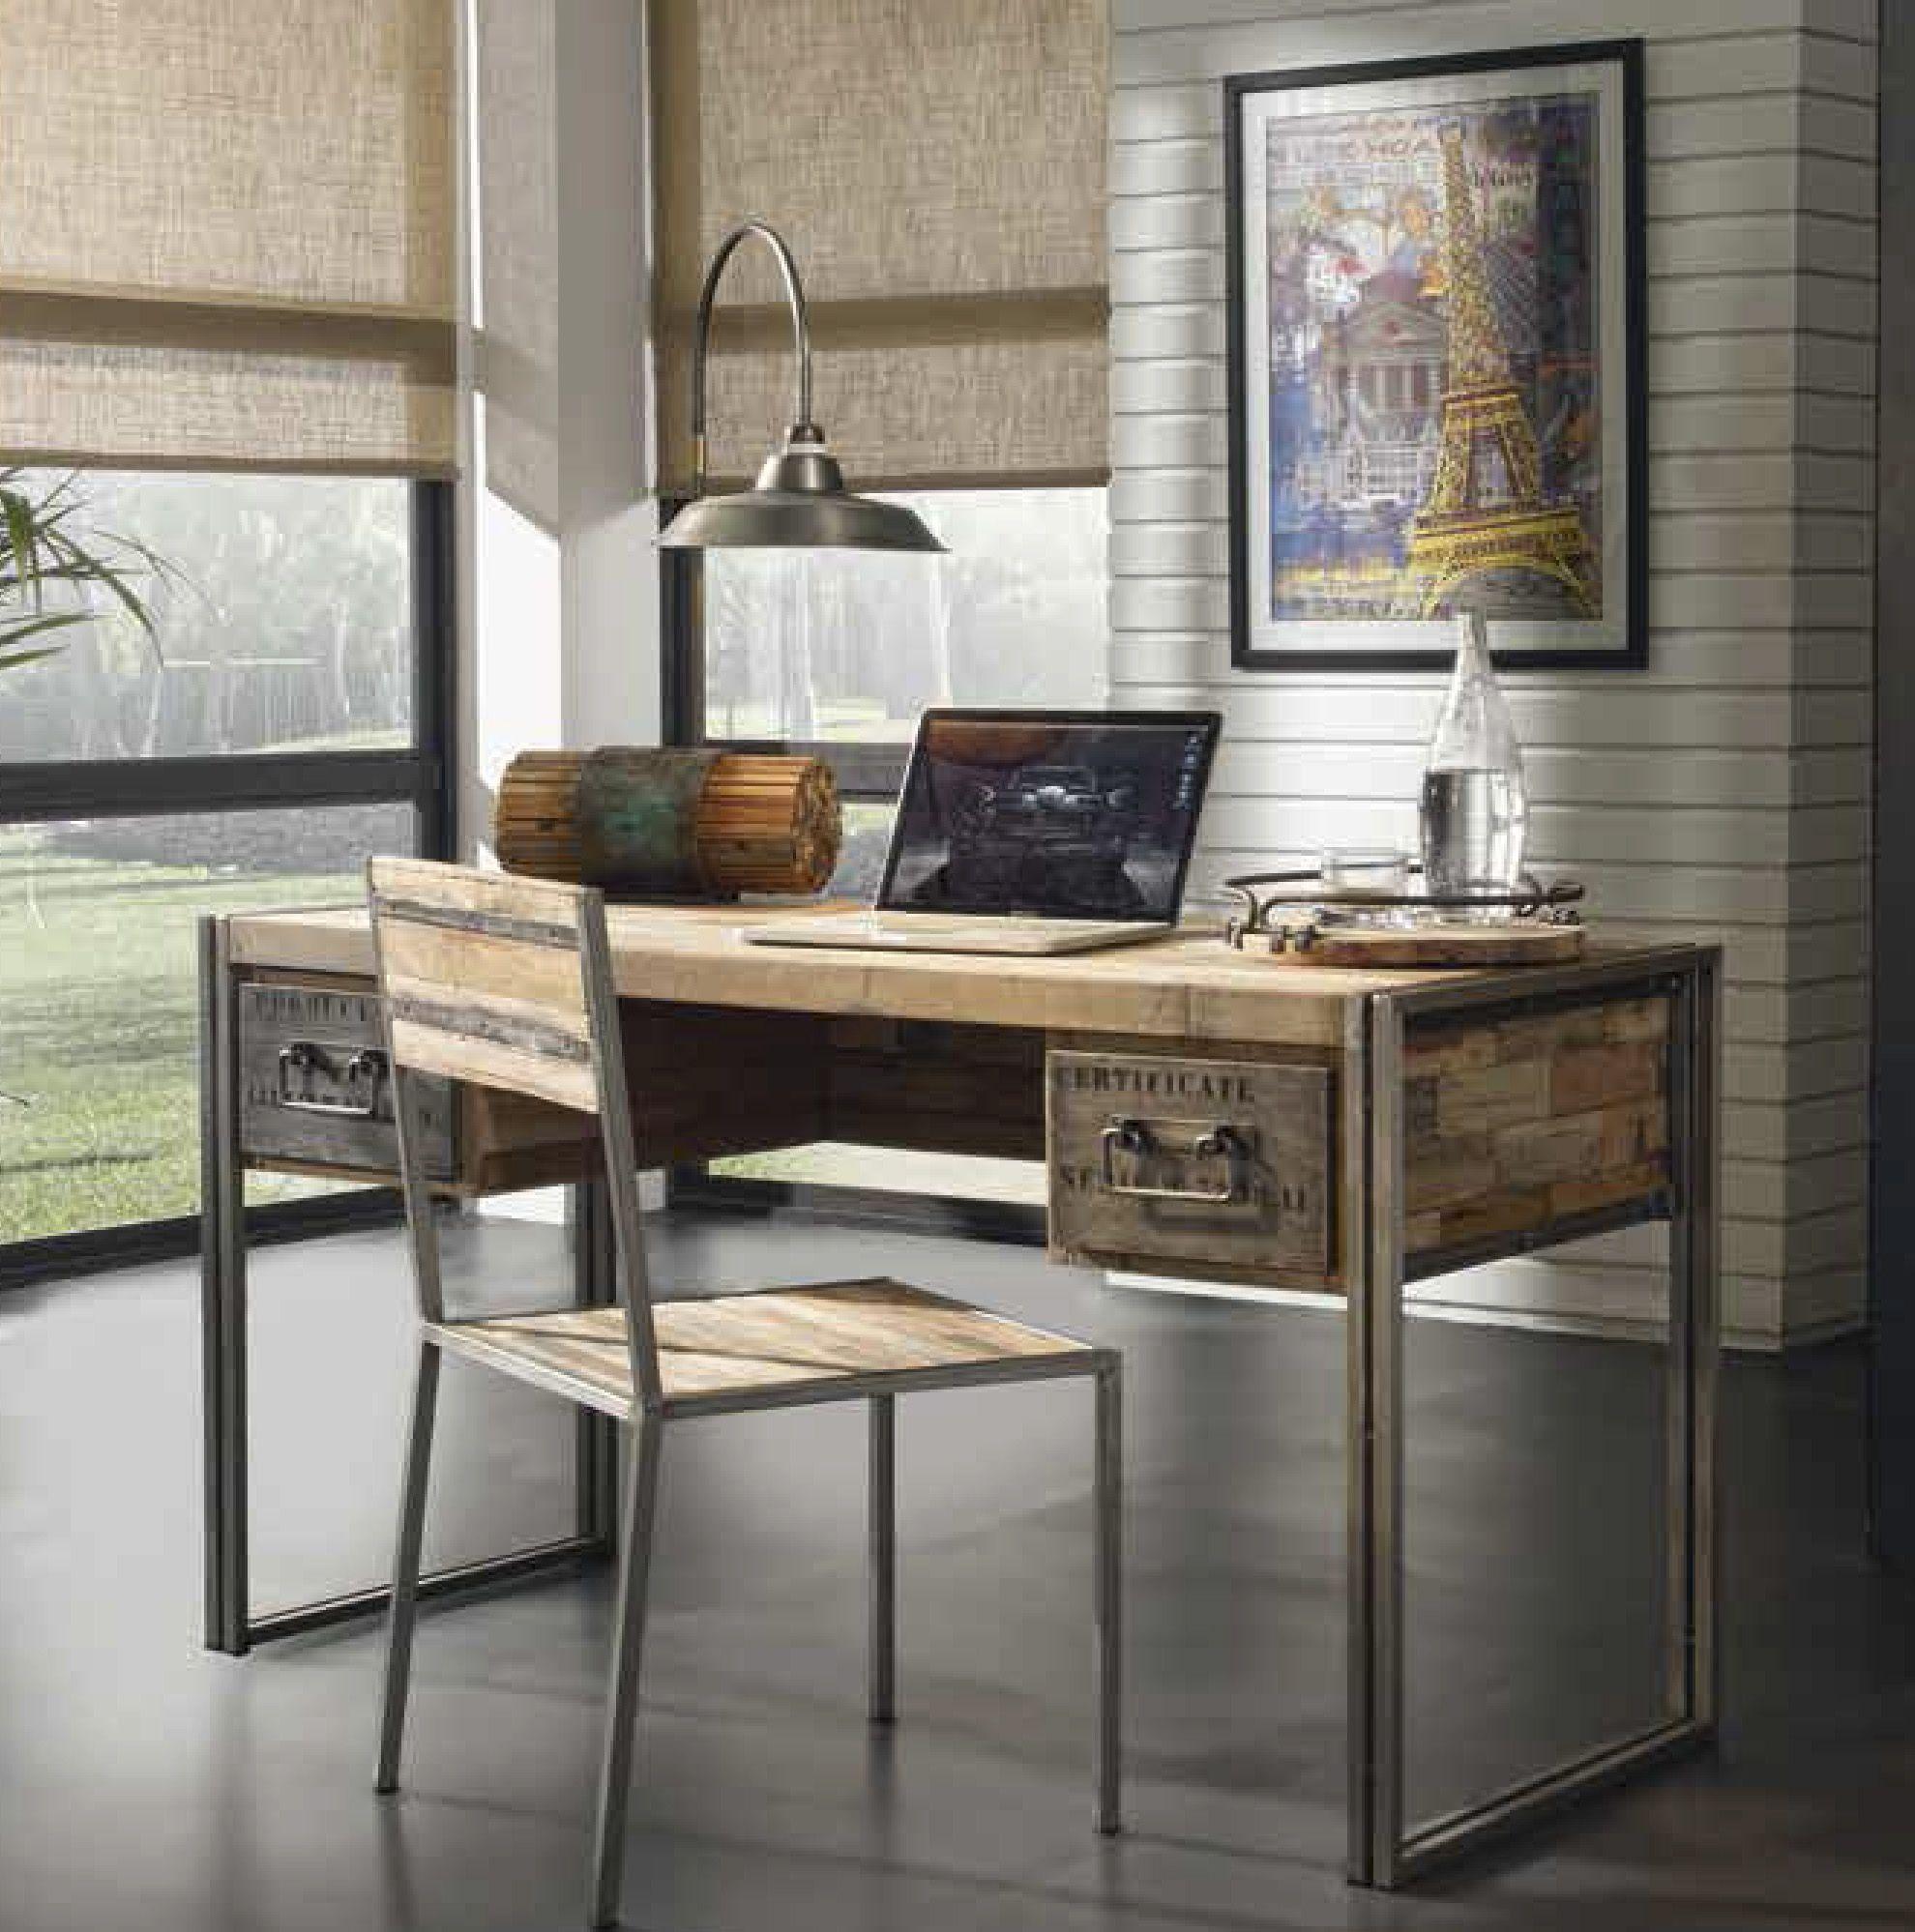 Mesa de estudio mesas muebles de dise o industrial for Muebles de diseno industrial